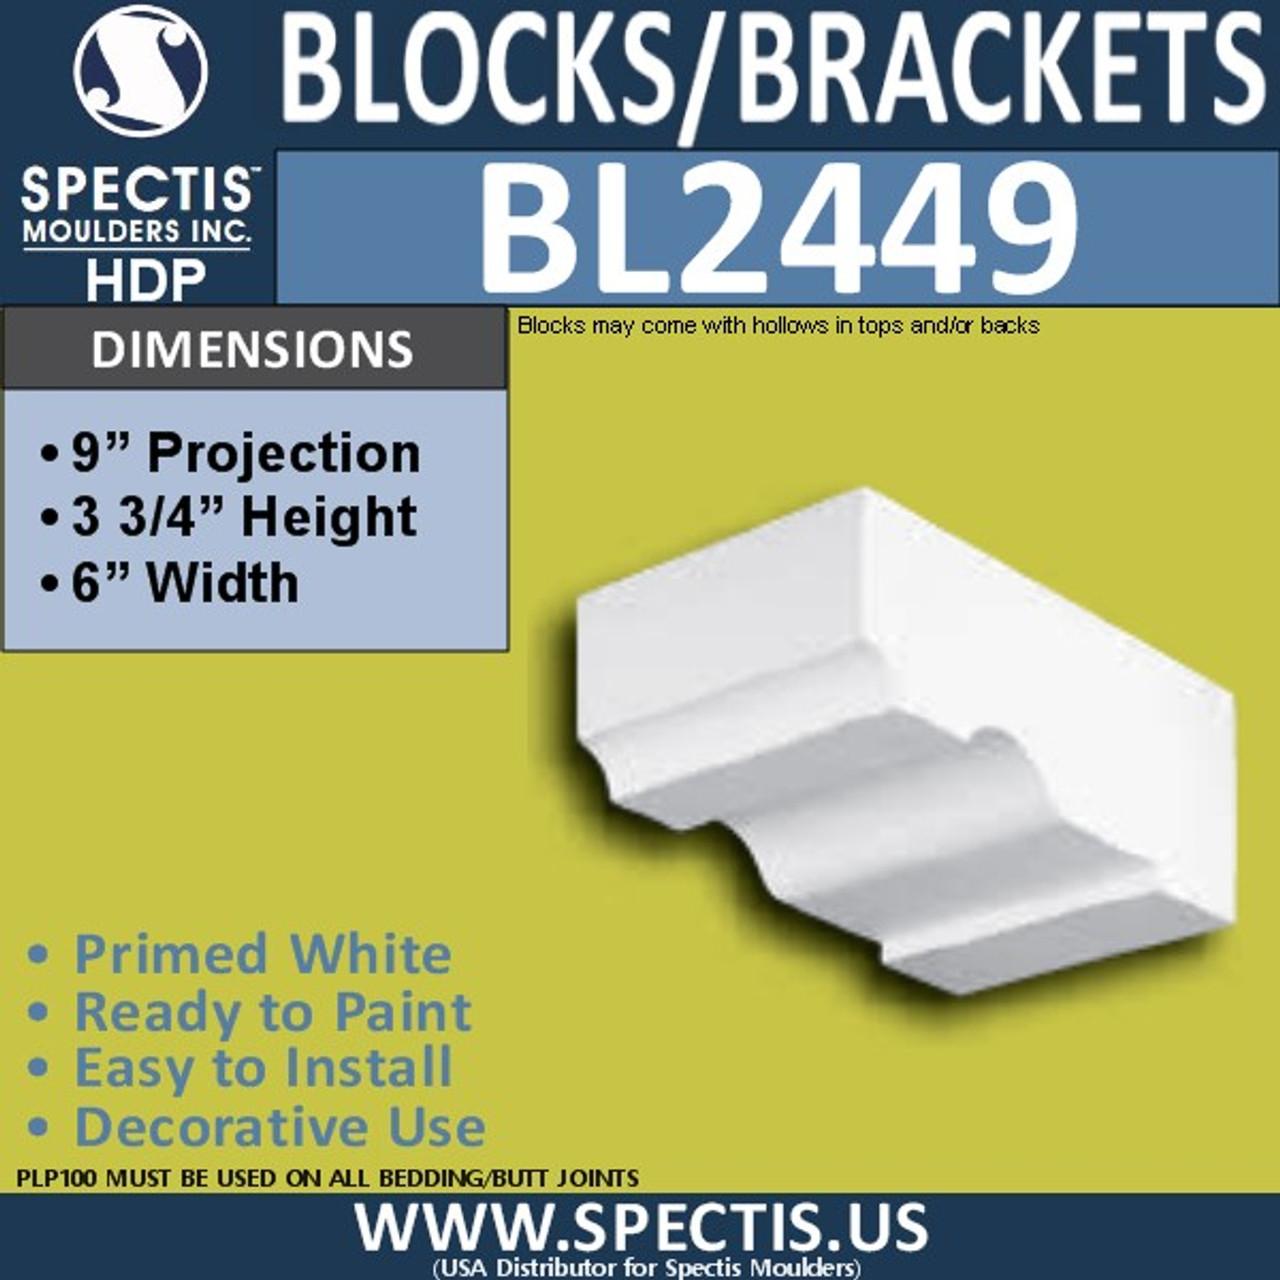 "BL2449 Eave Block or Bracket 6""W x 3.75""H x 9"" P"